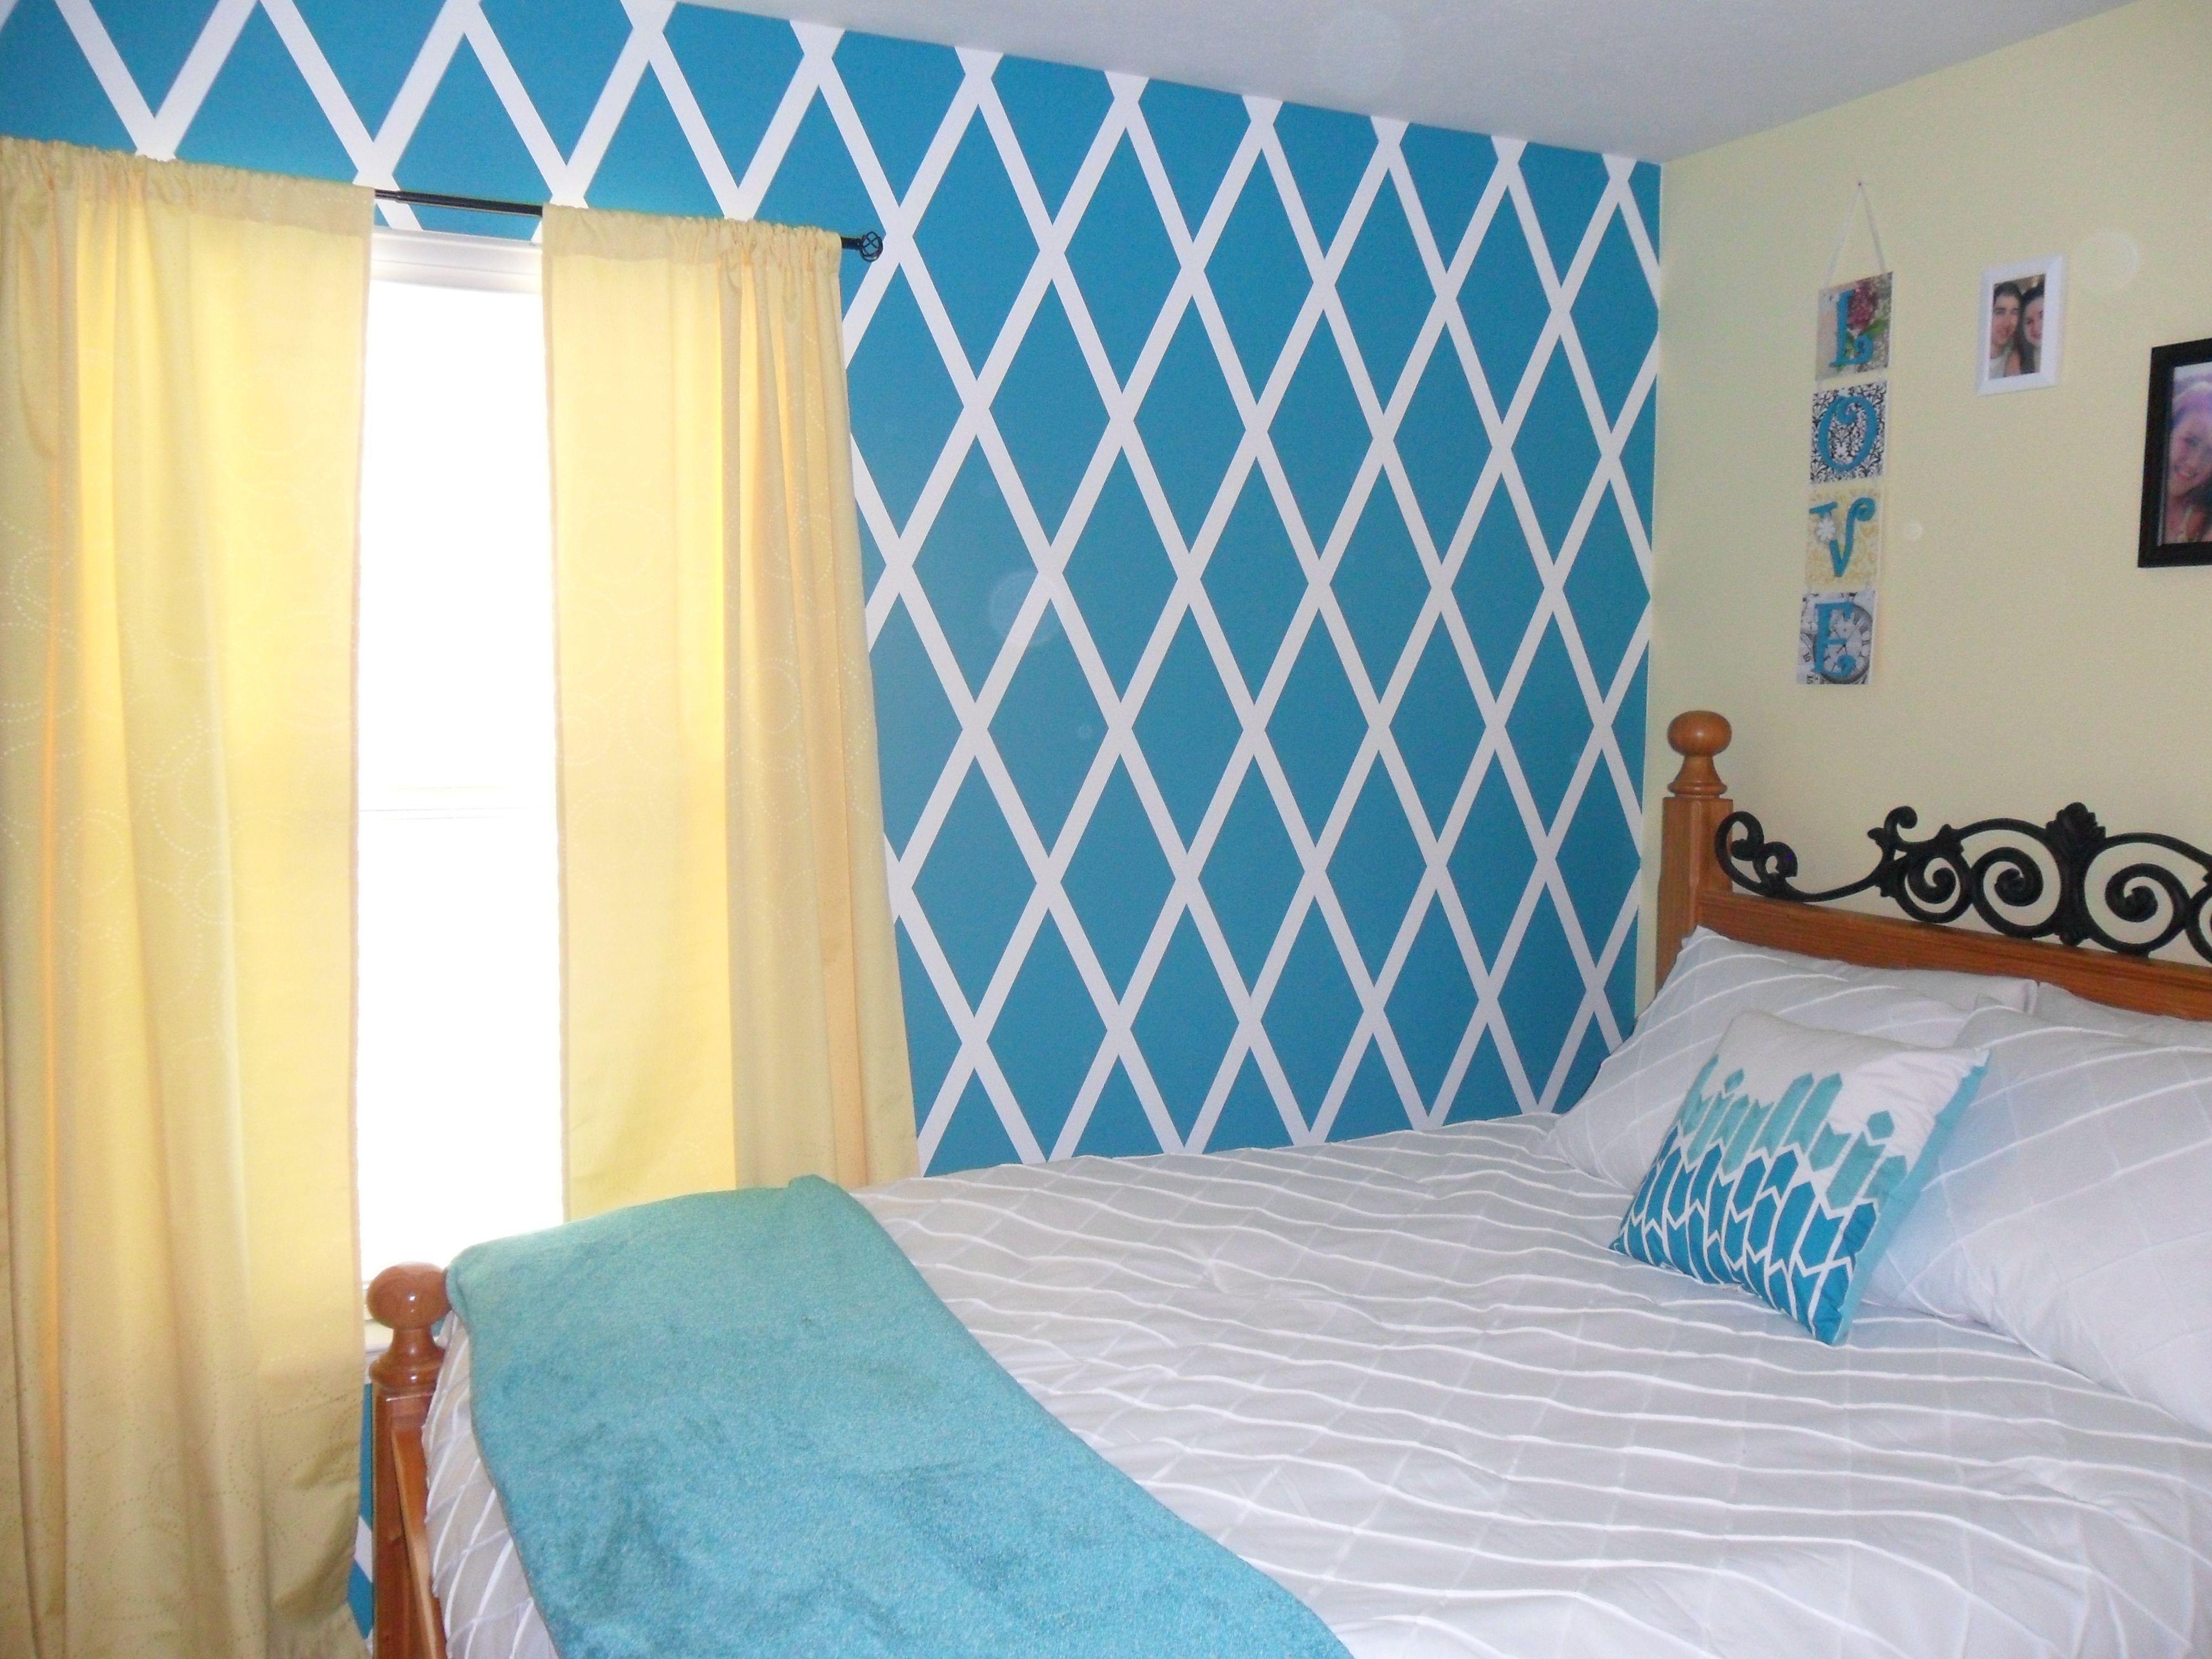 Diamond Design Painted Wall Bedroom Wall Designs Bedroom Diy